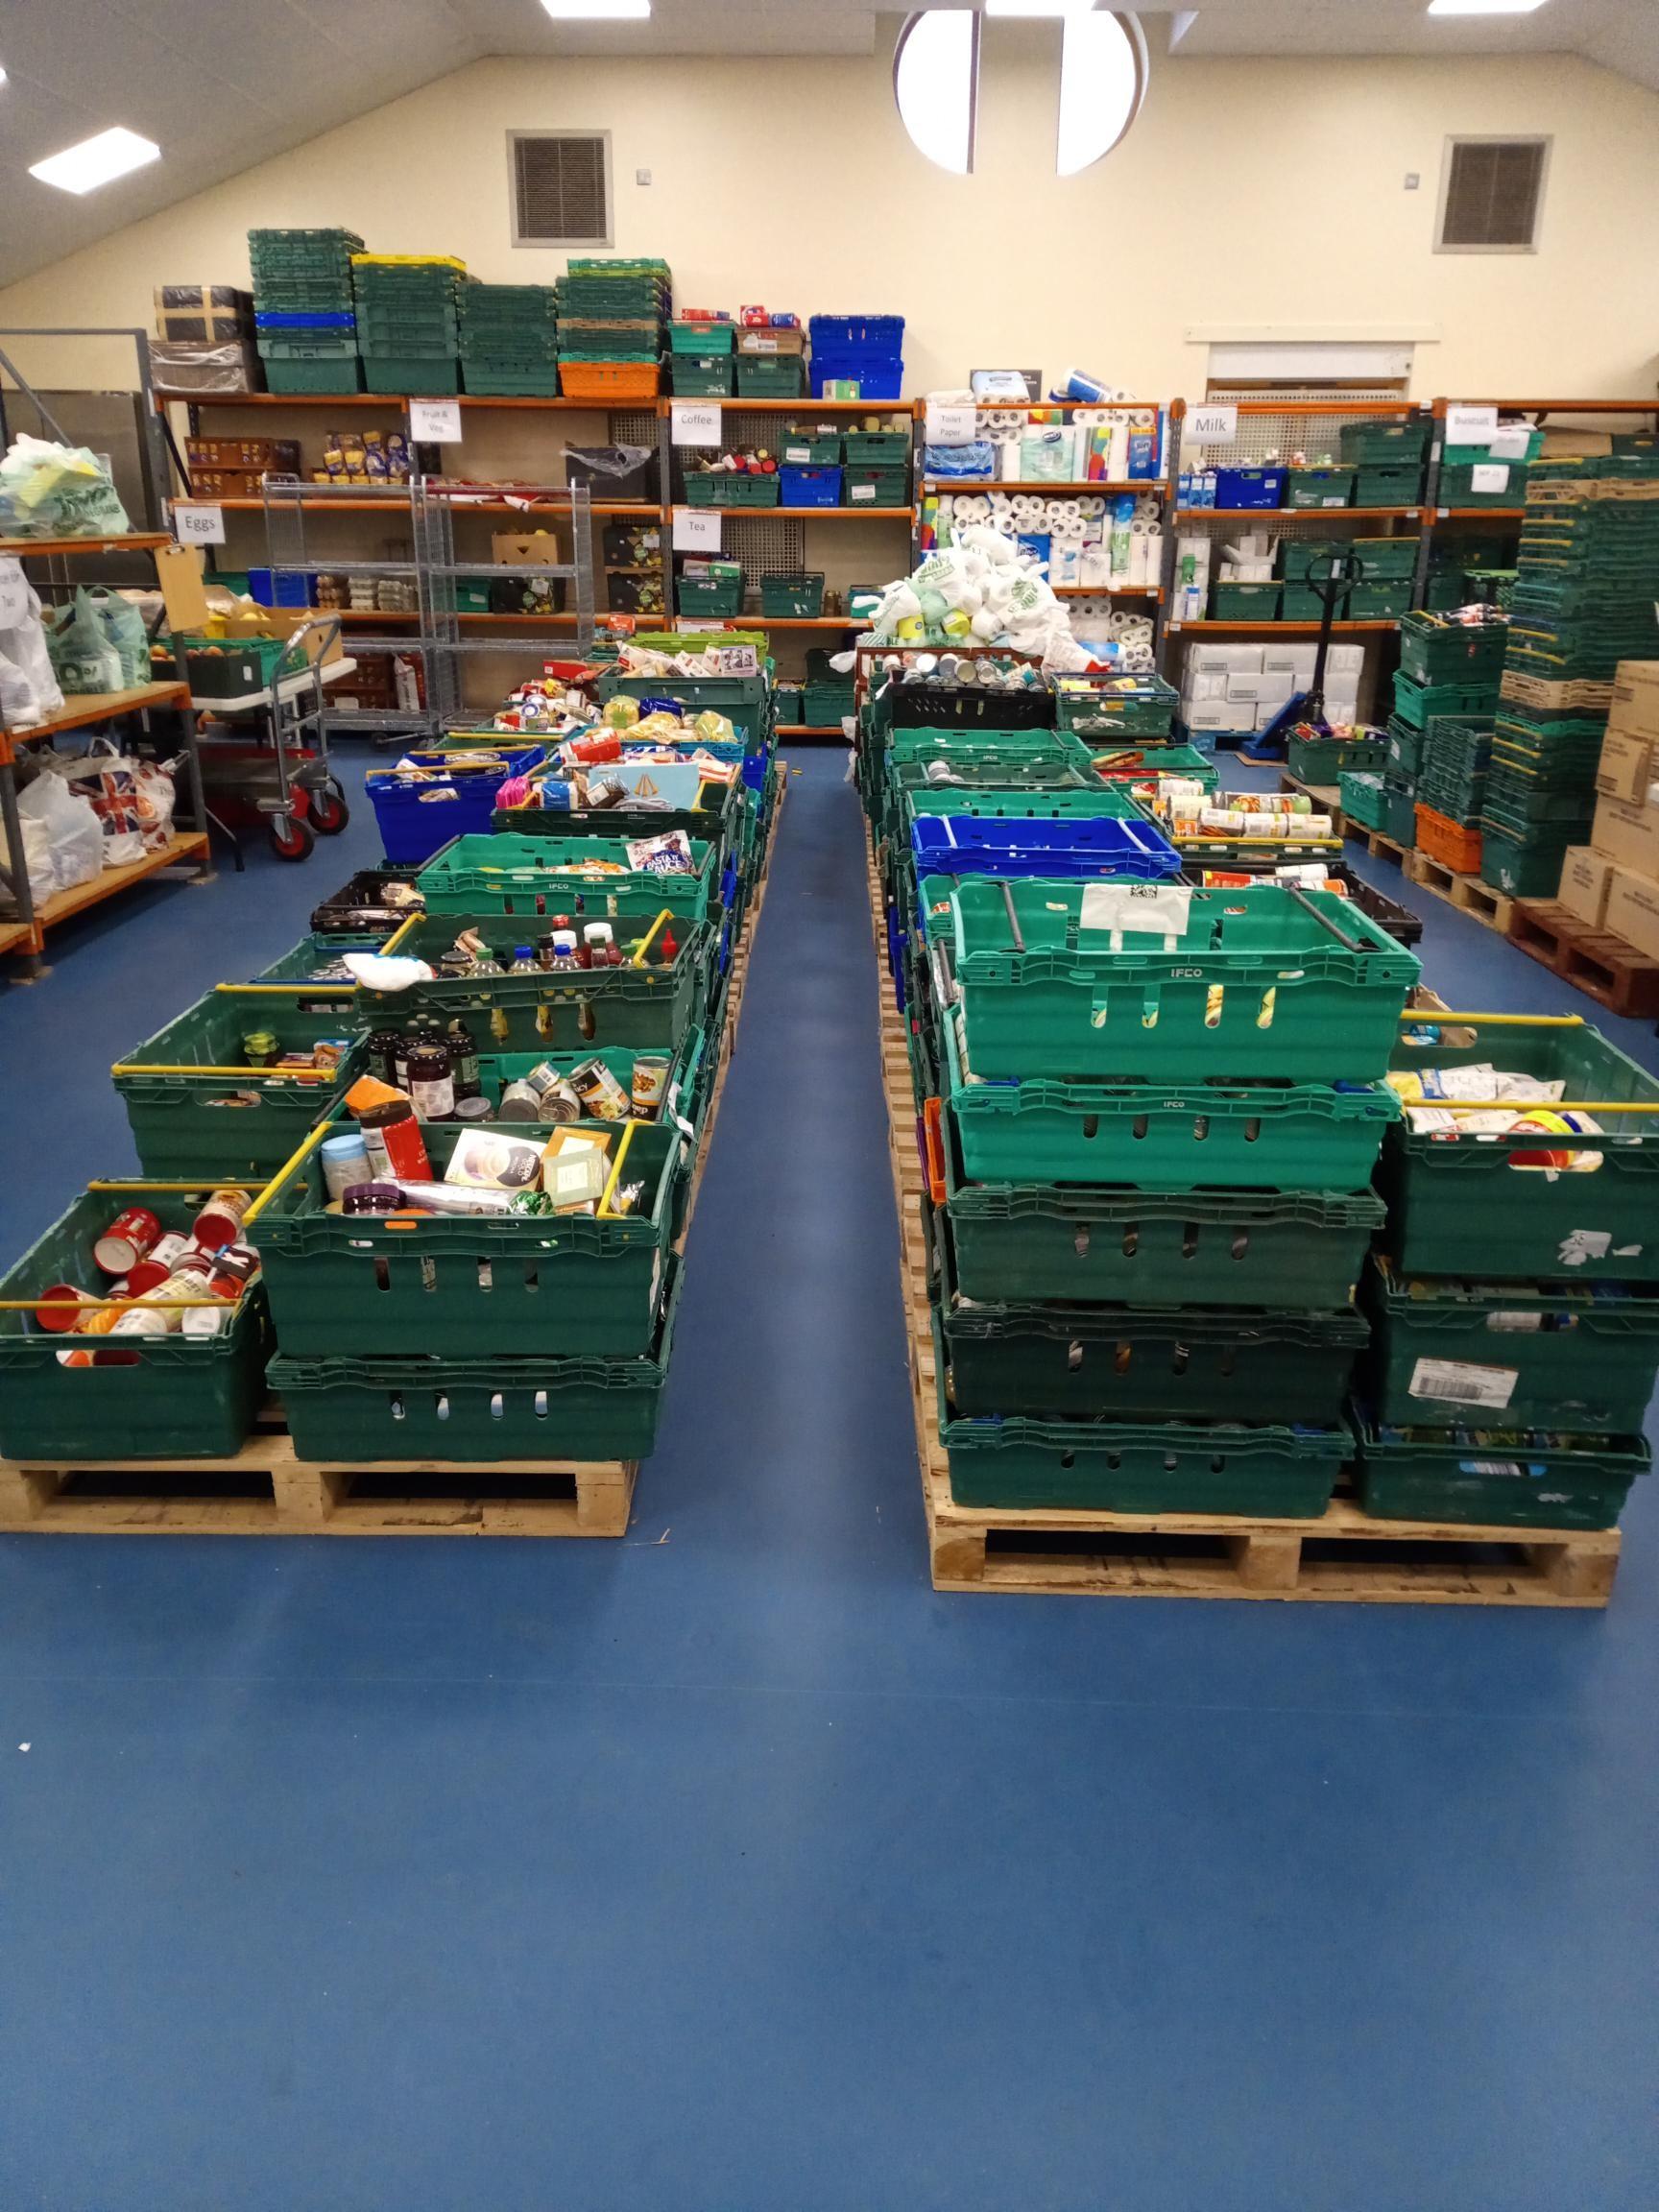 WORKSOP FOOD BANK WELCOMES AMAZON'S SUPPORT